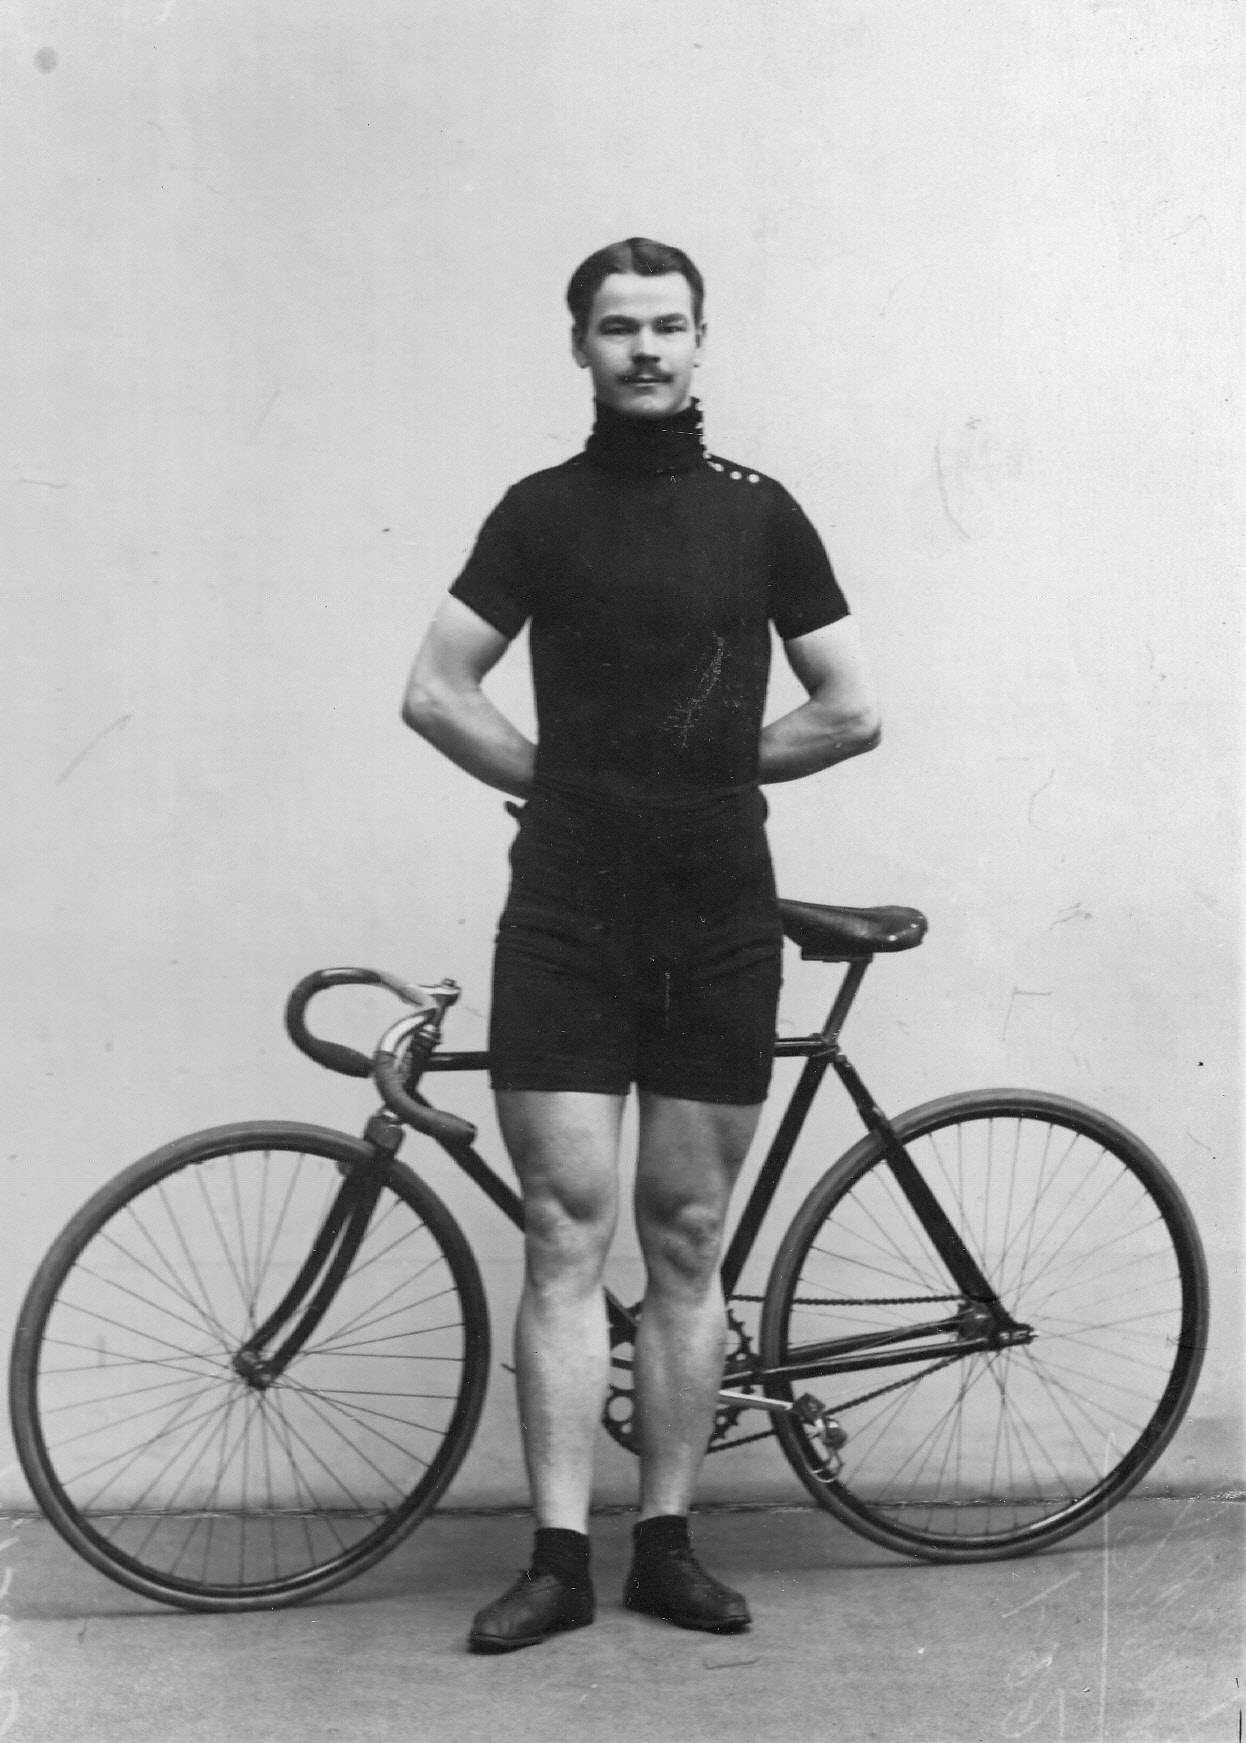 Велогонщик, чемпион Германии Майер, представляющий фирму Дюркопп